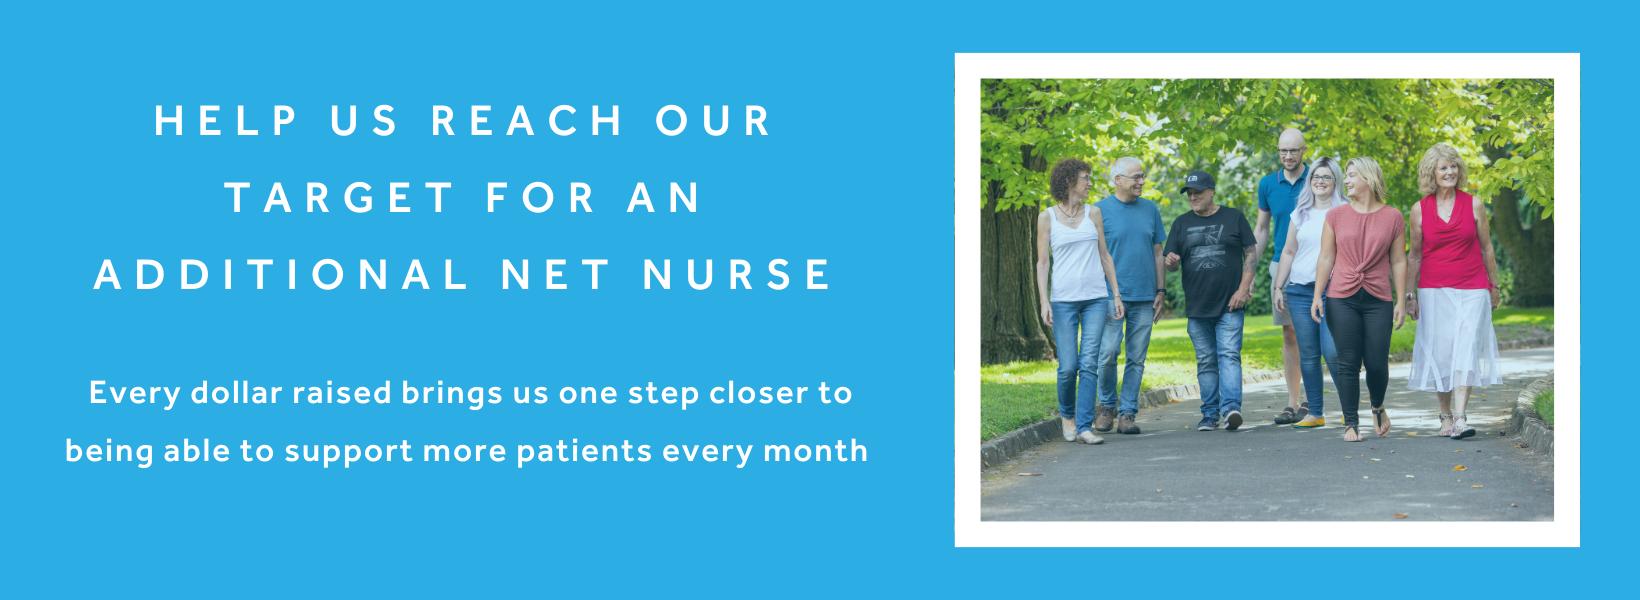 NET Nurse Donation page